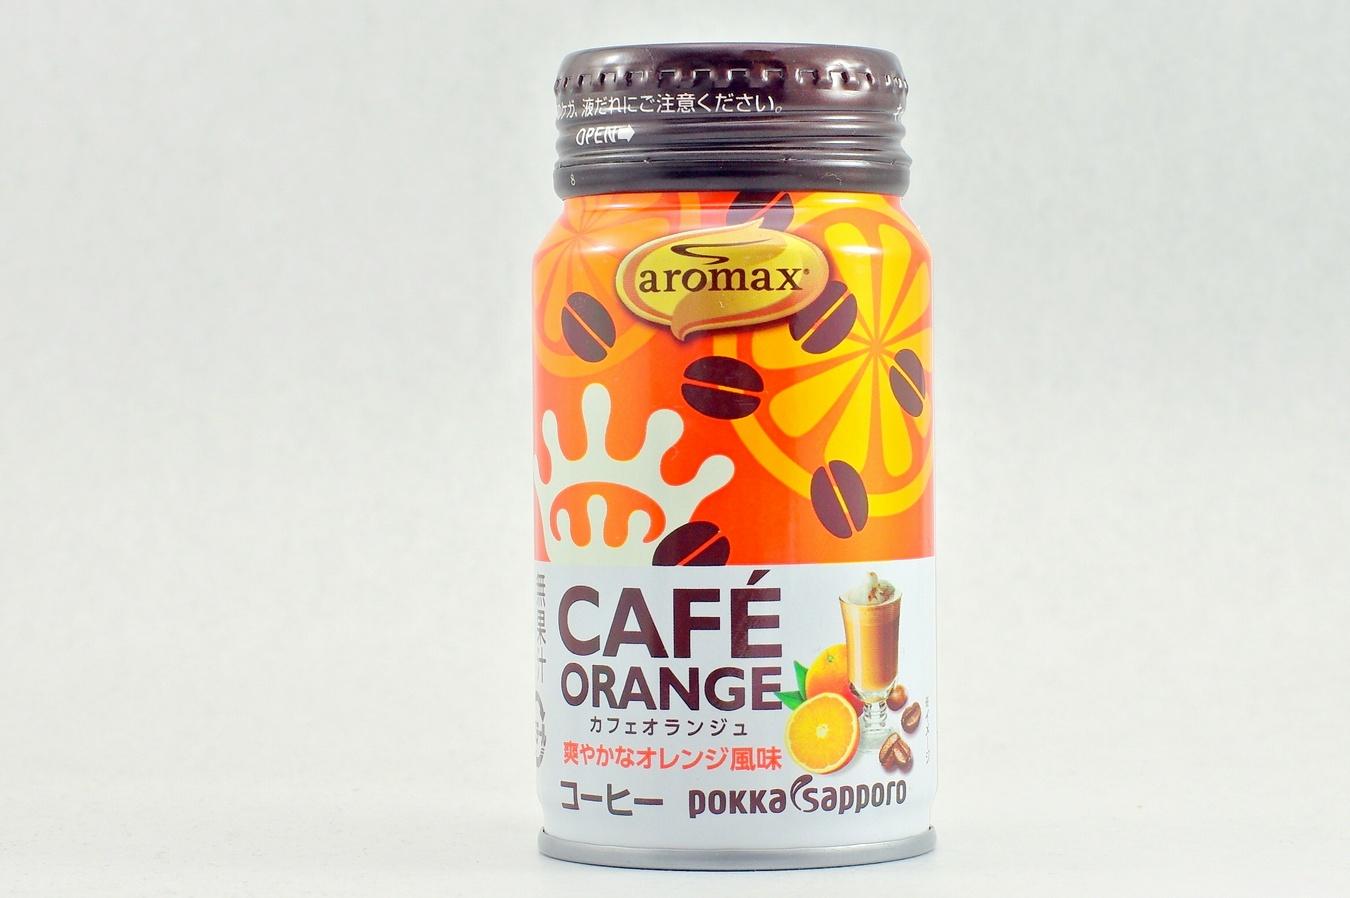 aromax カフェオランジュ